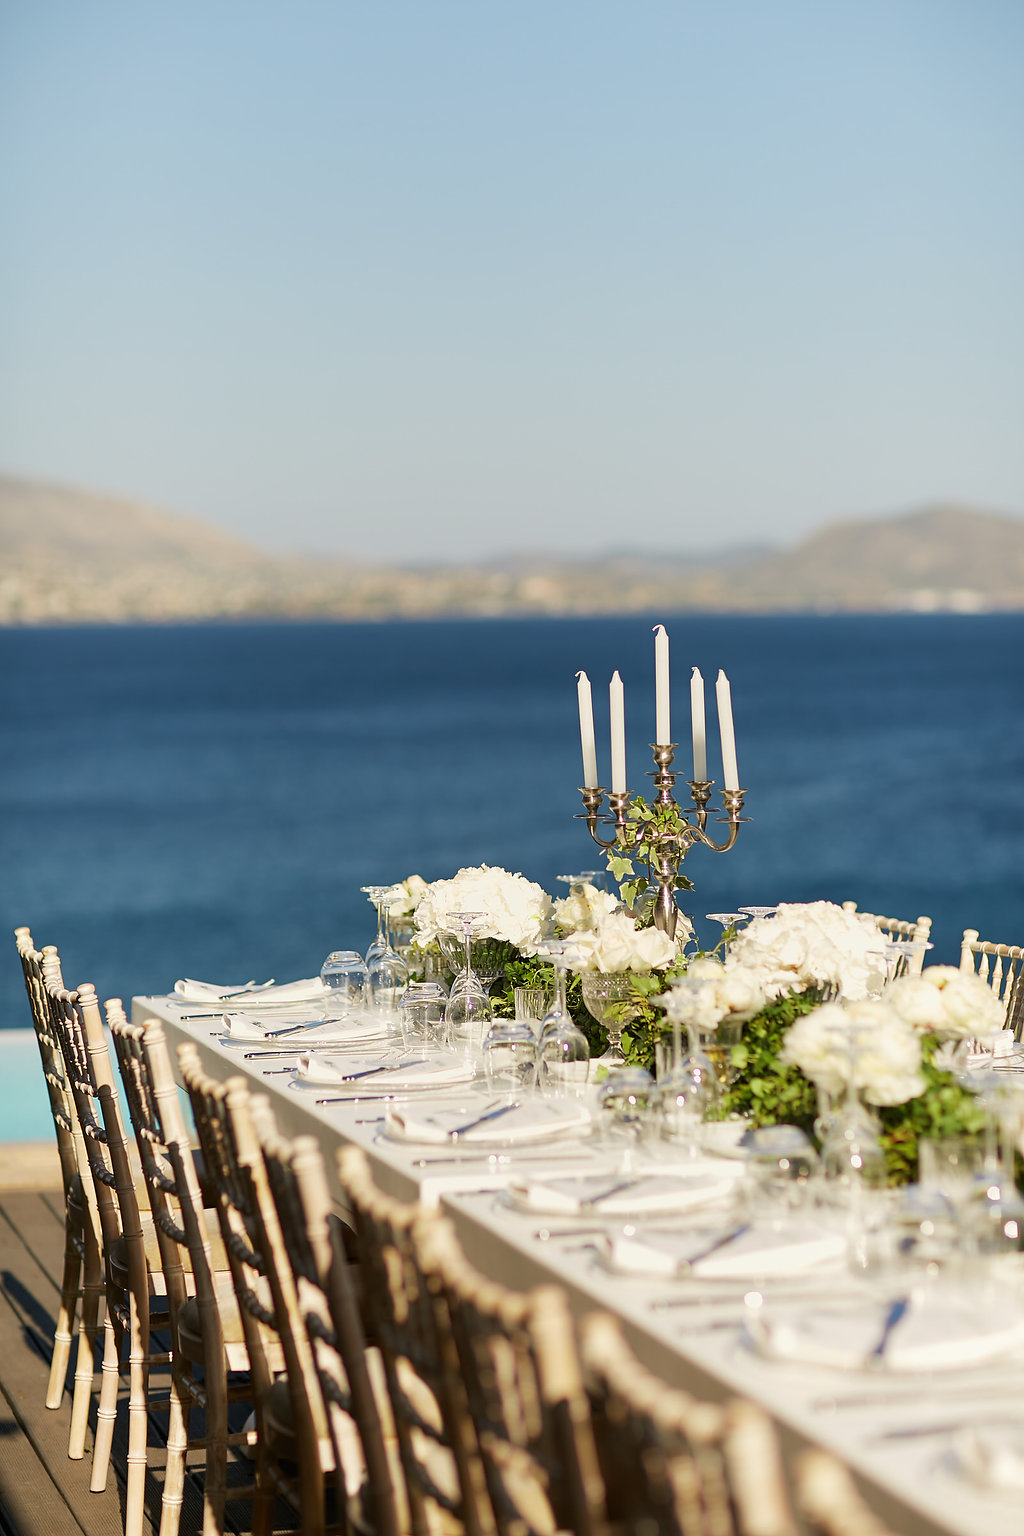 organic wedding inspiration in Greece - photo by Sotiris Tsakanikas http://ruffledblog.com/chic-sunset-wedding-on-the-athens-riviera